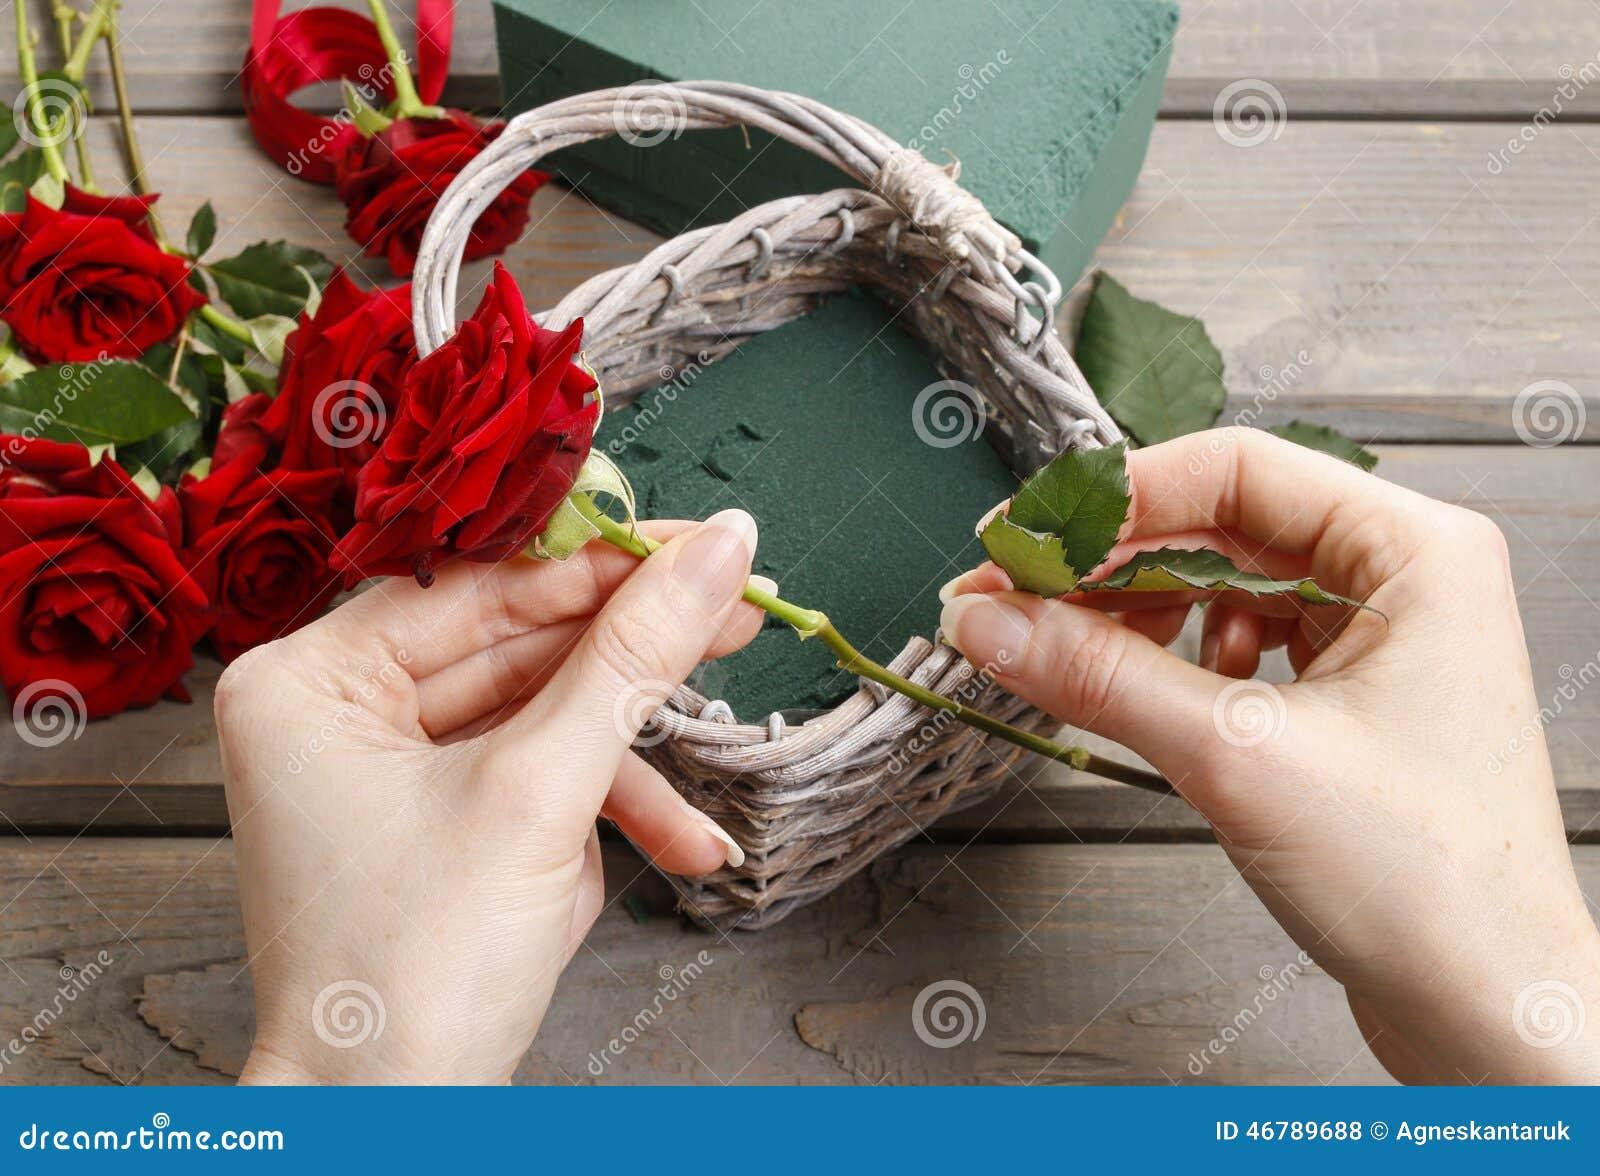 Comment Faire Un Bouquet De Roses how to make bouquet of roses in wicker basket tutorial stock